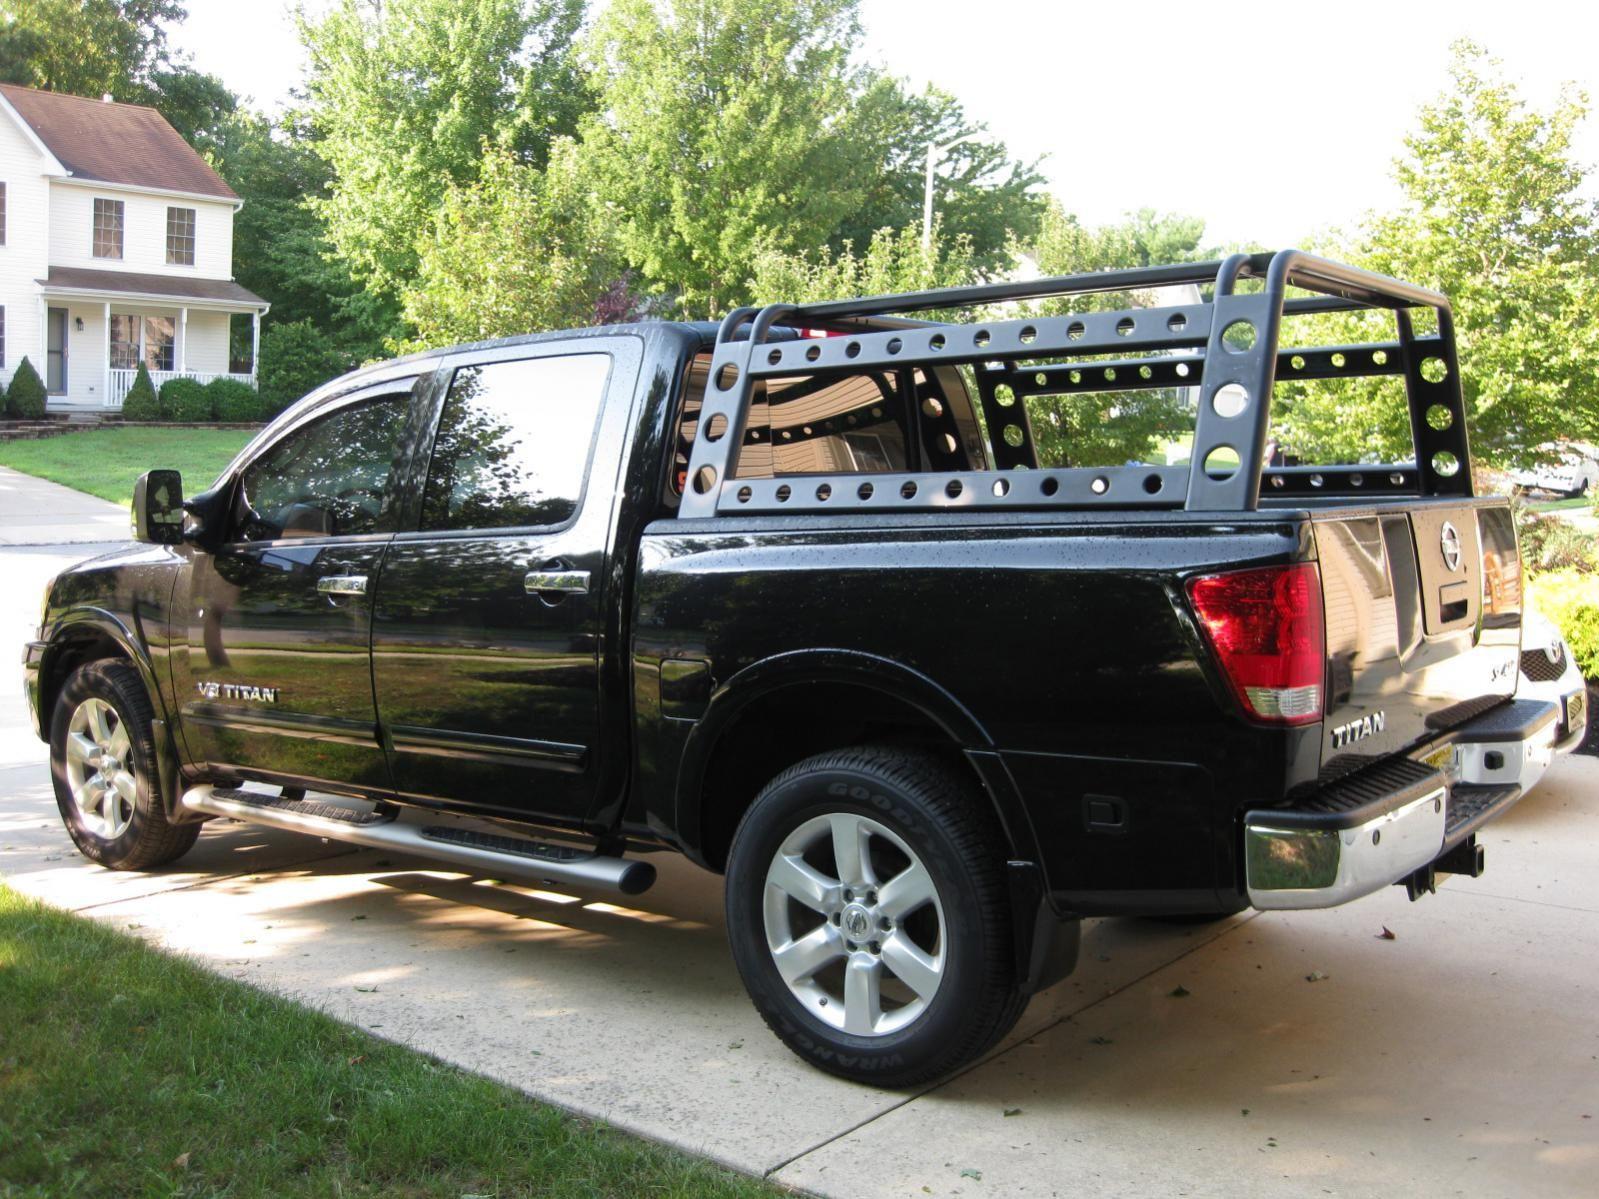 diy camper shell - google search | truck hacks | truck